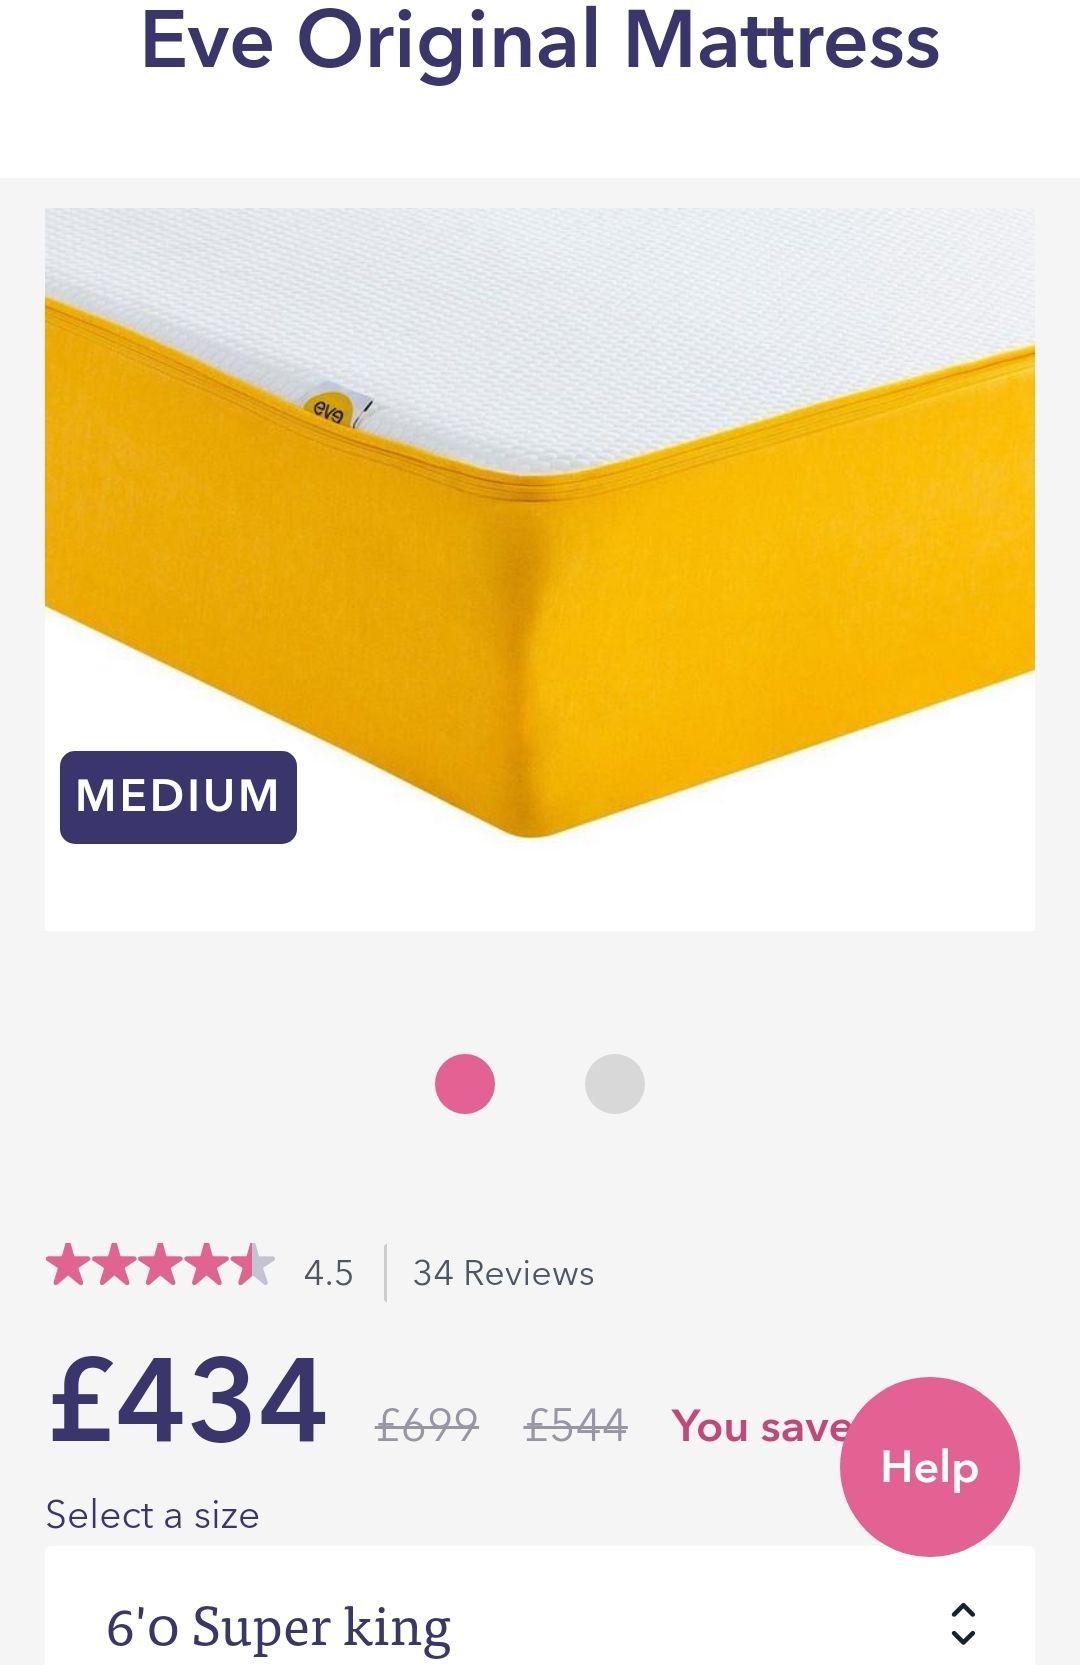 Eve superking mattress £434 @ Dreams